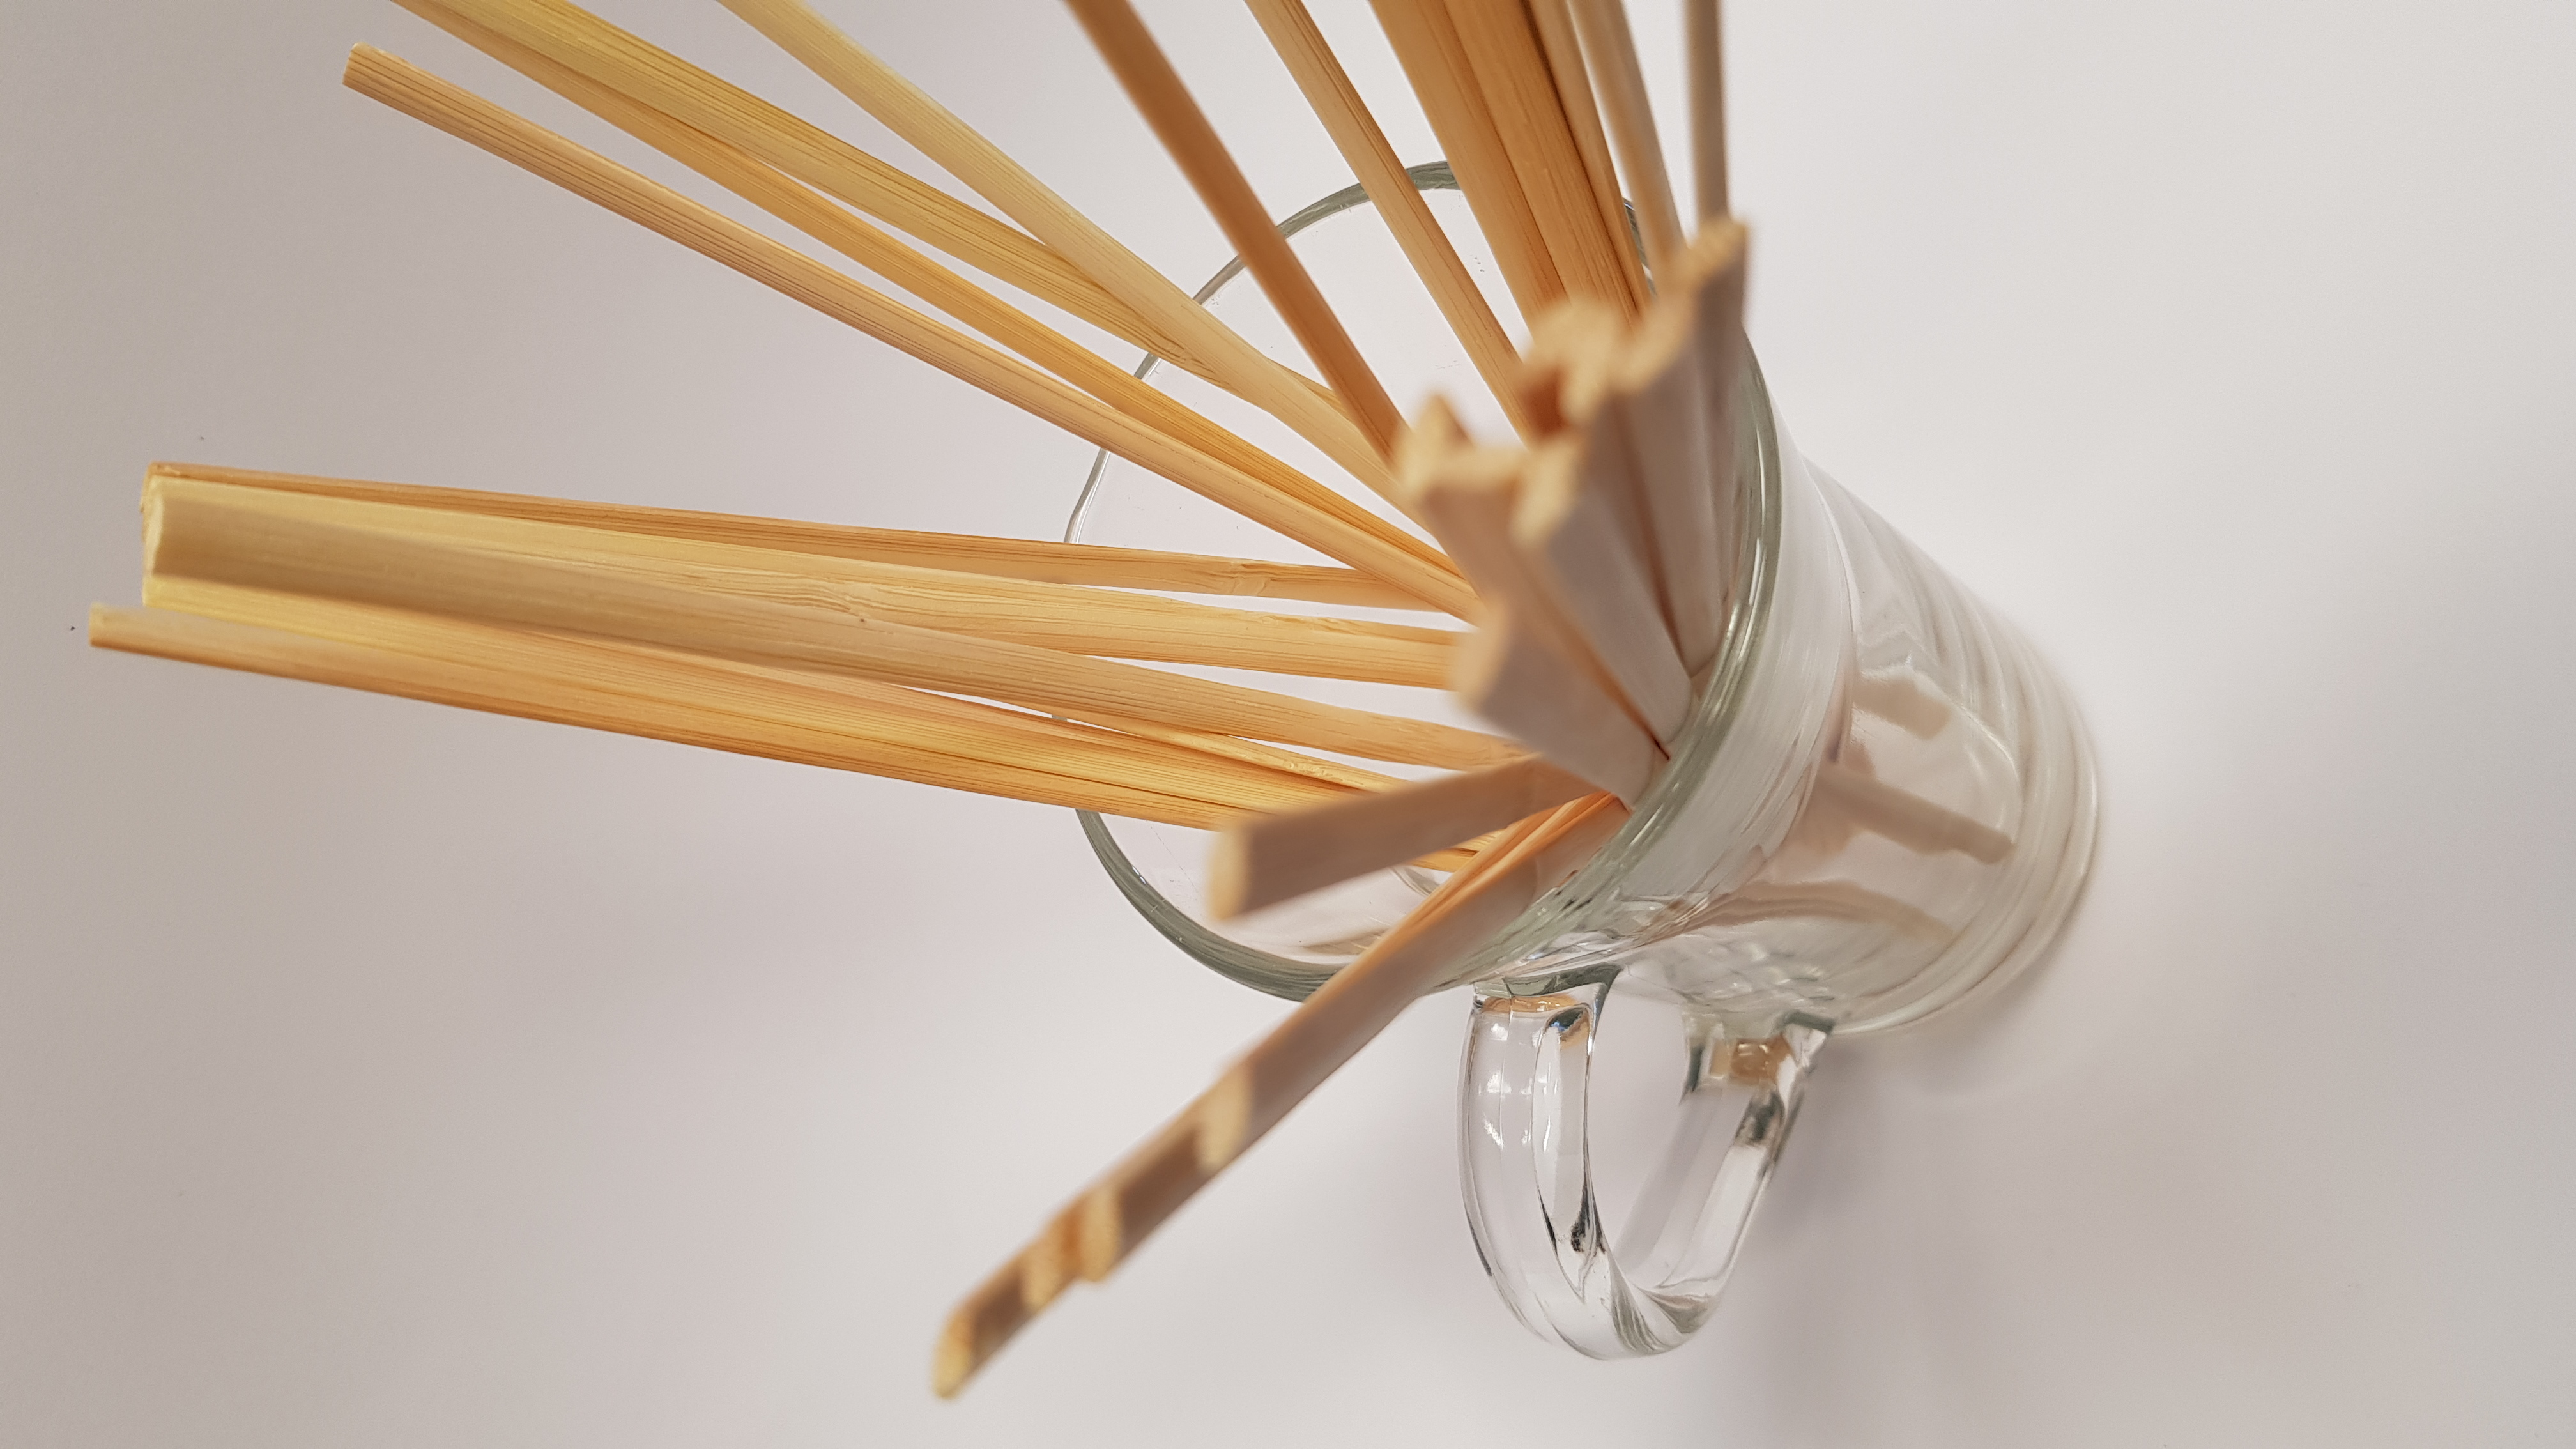 Bamboo Stirrers 7.5